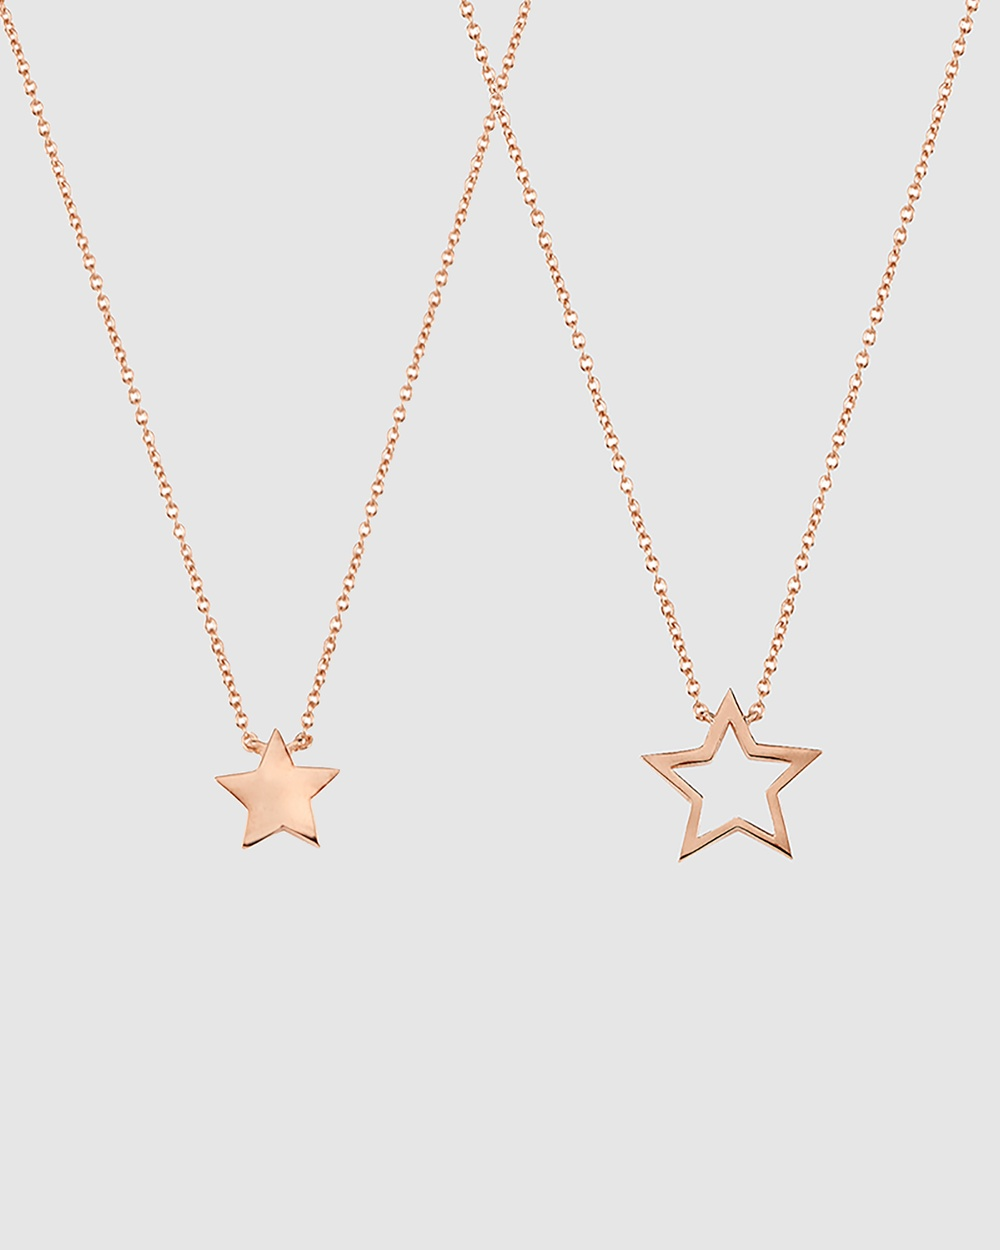 Secret Sisterhood Star Friendship Necklaces Jewellery Rose Gold